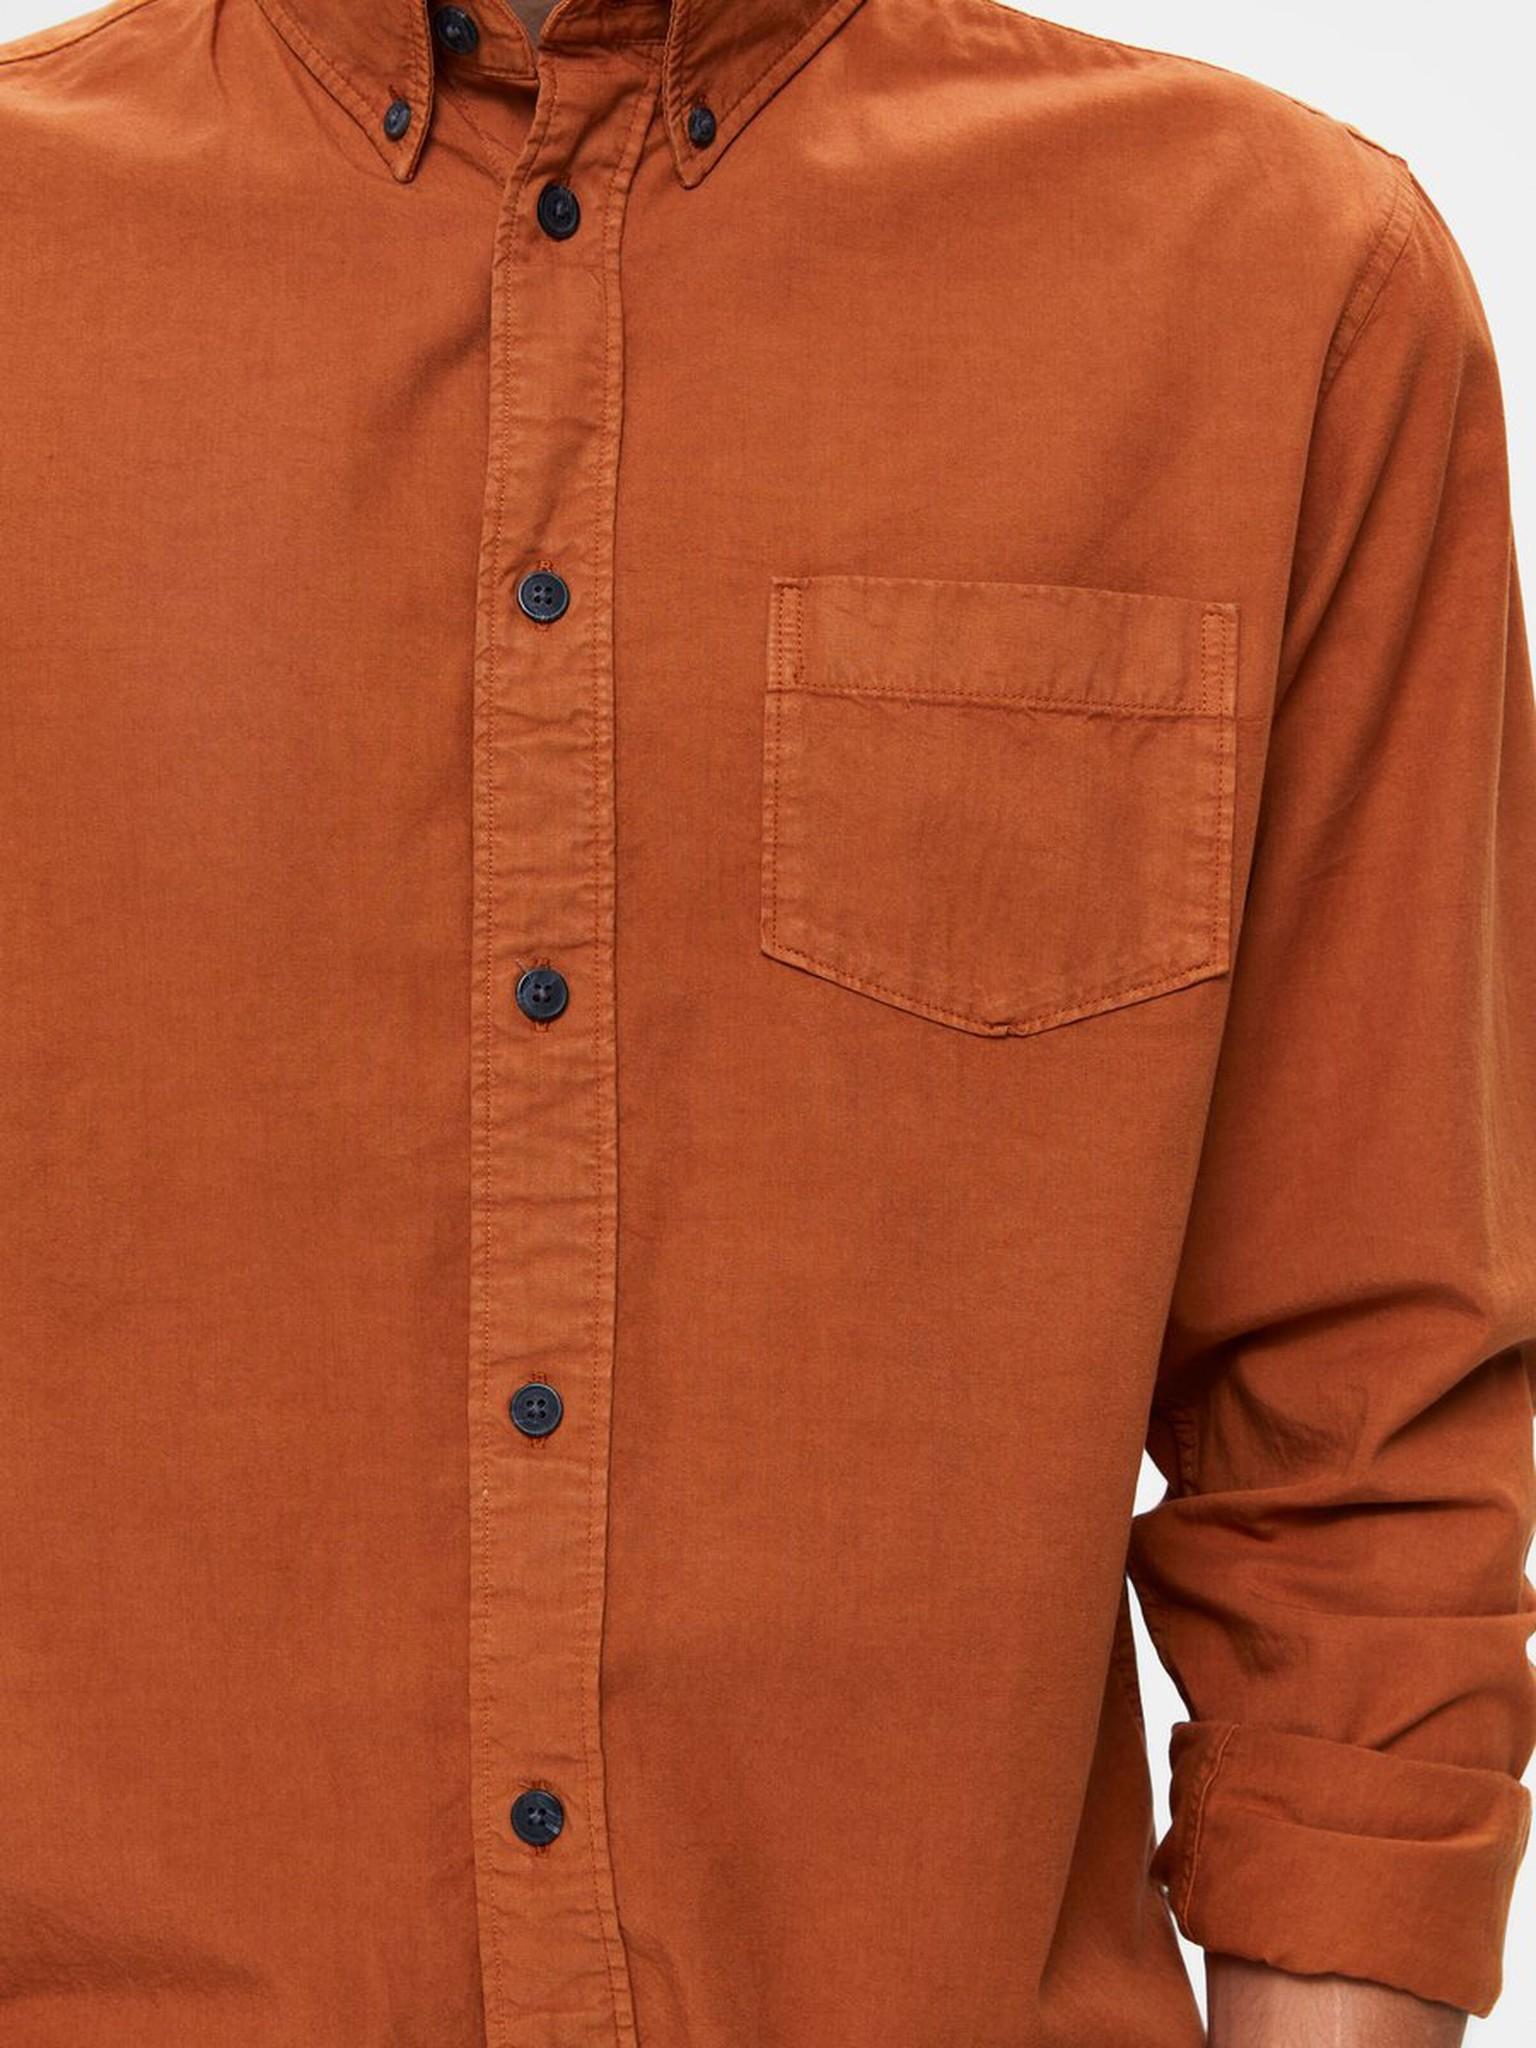 SELECTED chemise boutonnée-12